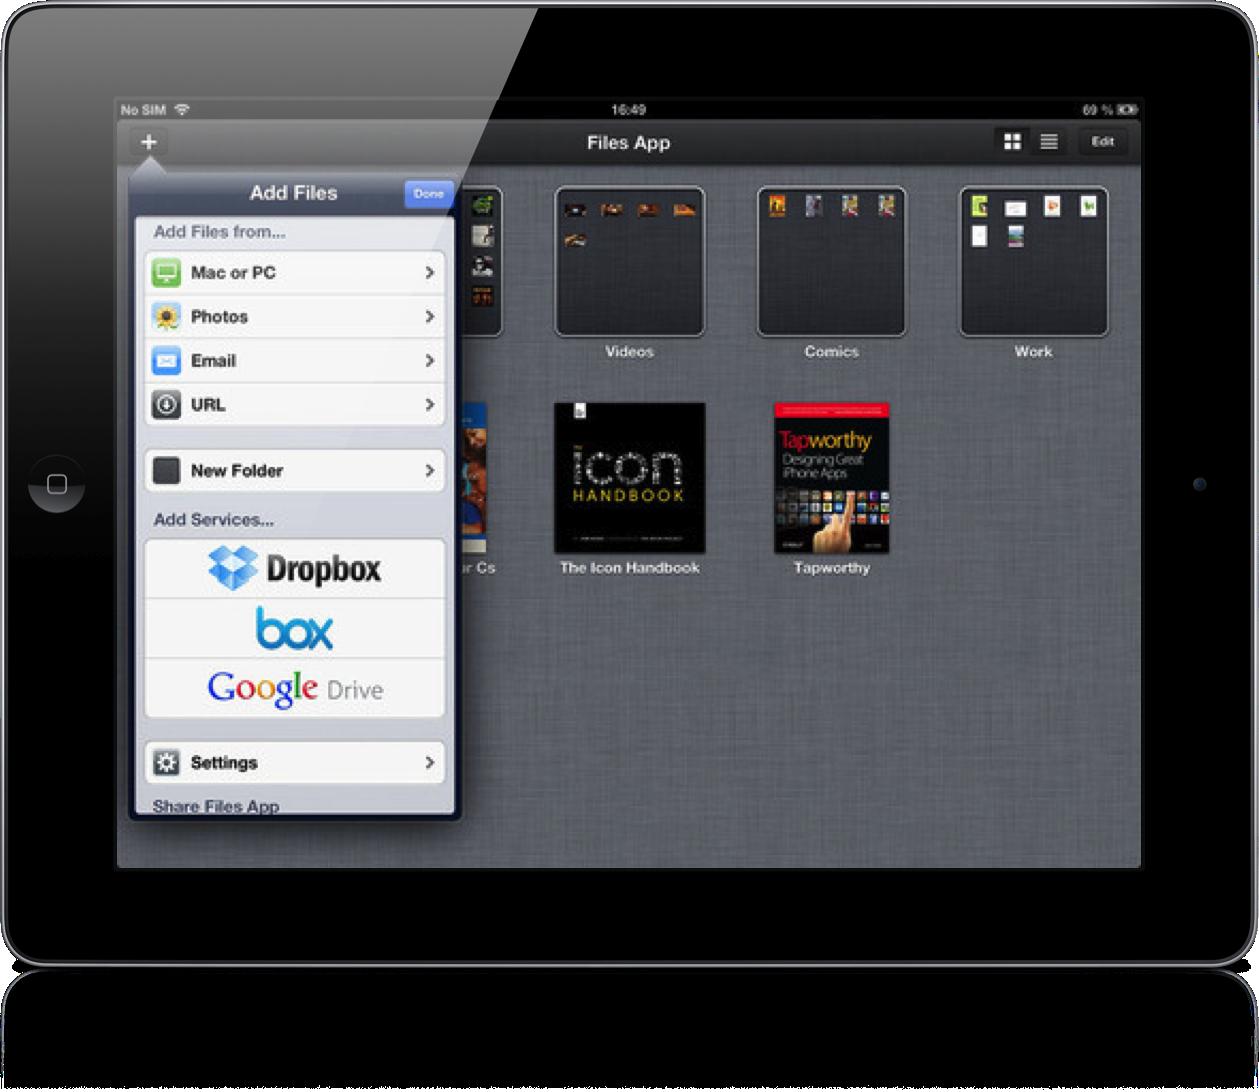 Files App for iPad